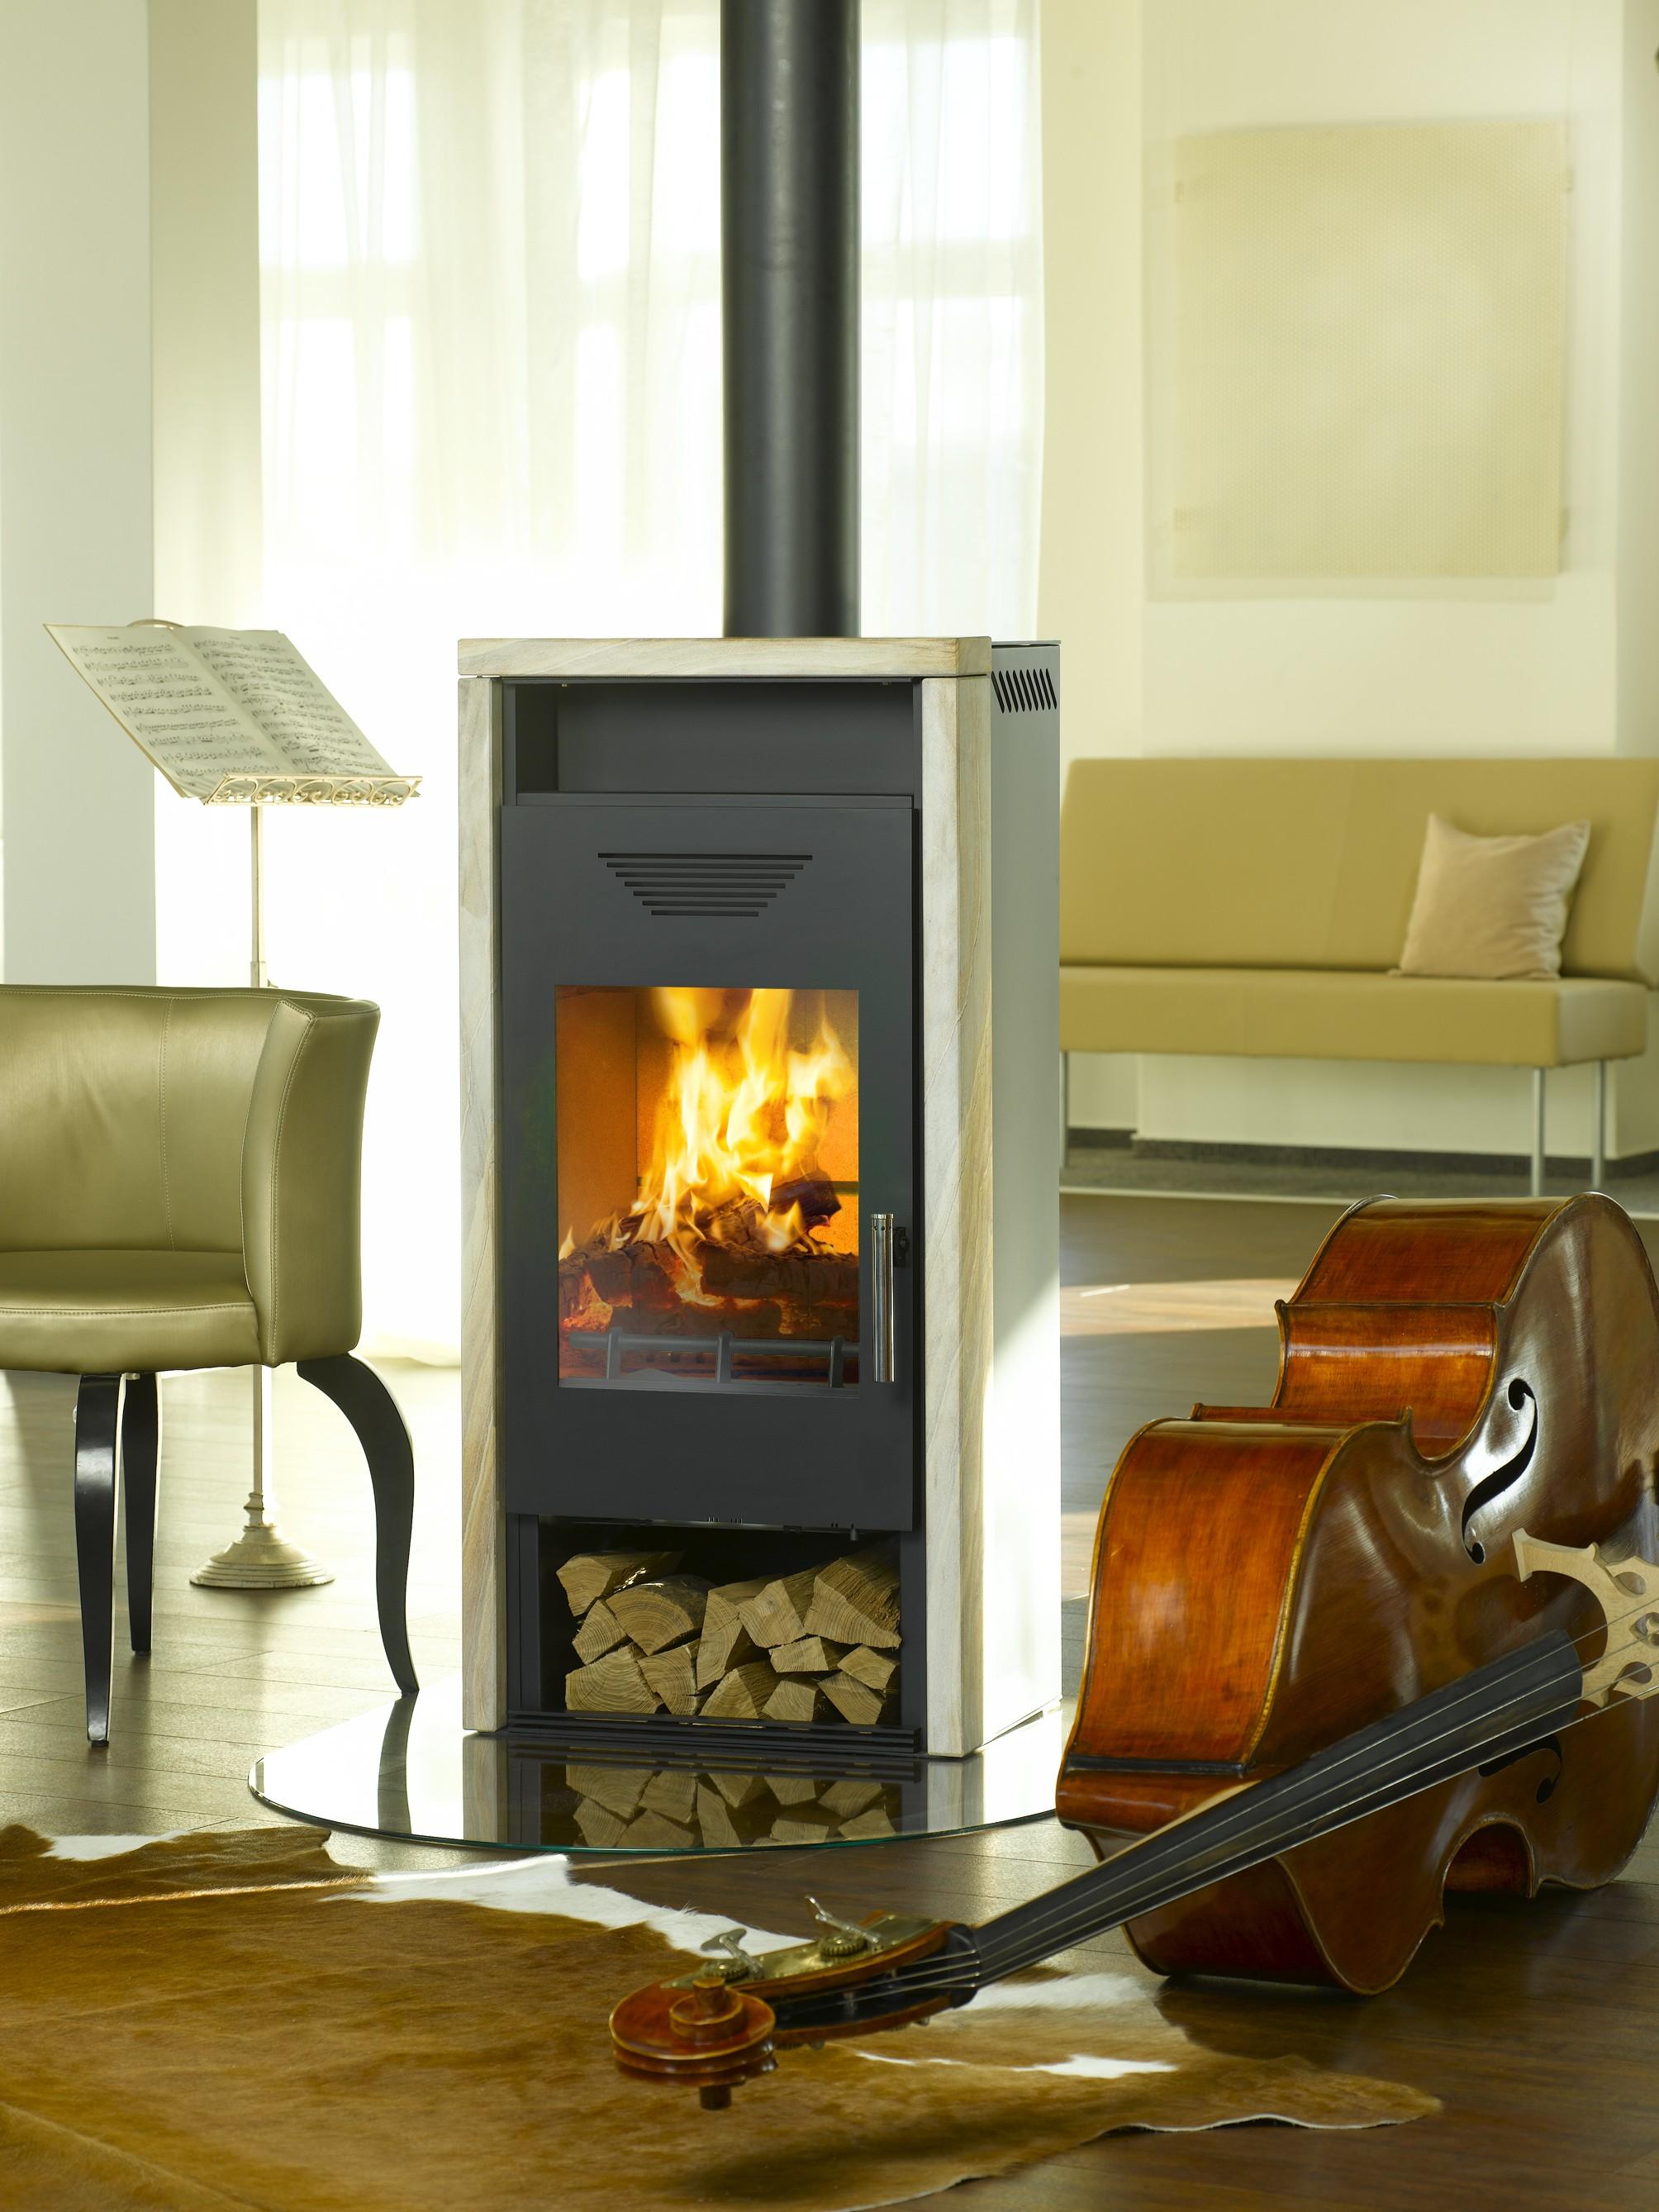 kaminofen wamsler kf 111 yara stahl sandstein 6 kw bei. Black Bedroom Furniture Sets. Home Design Ideas